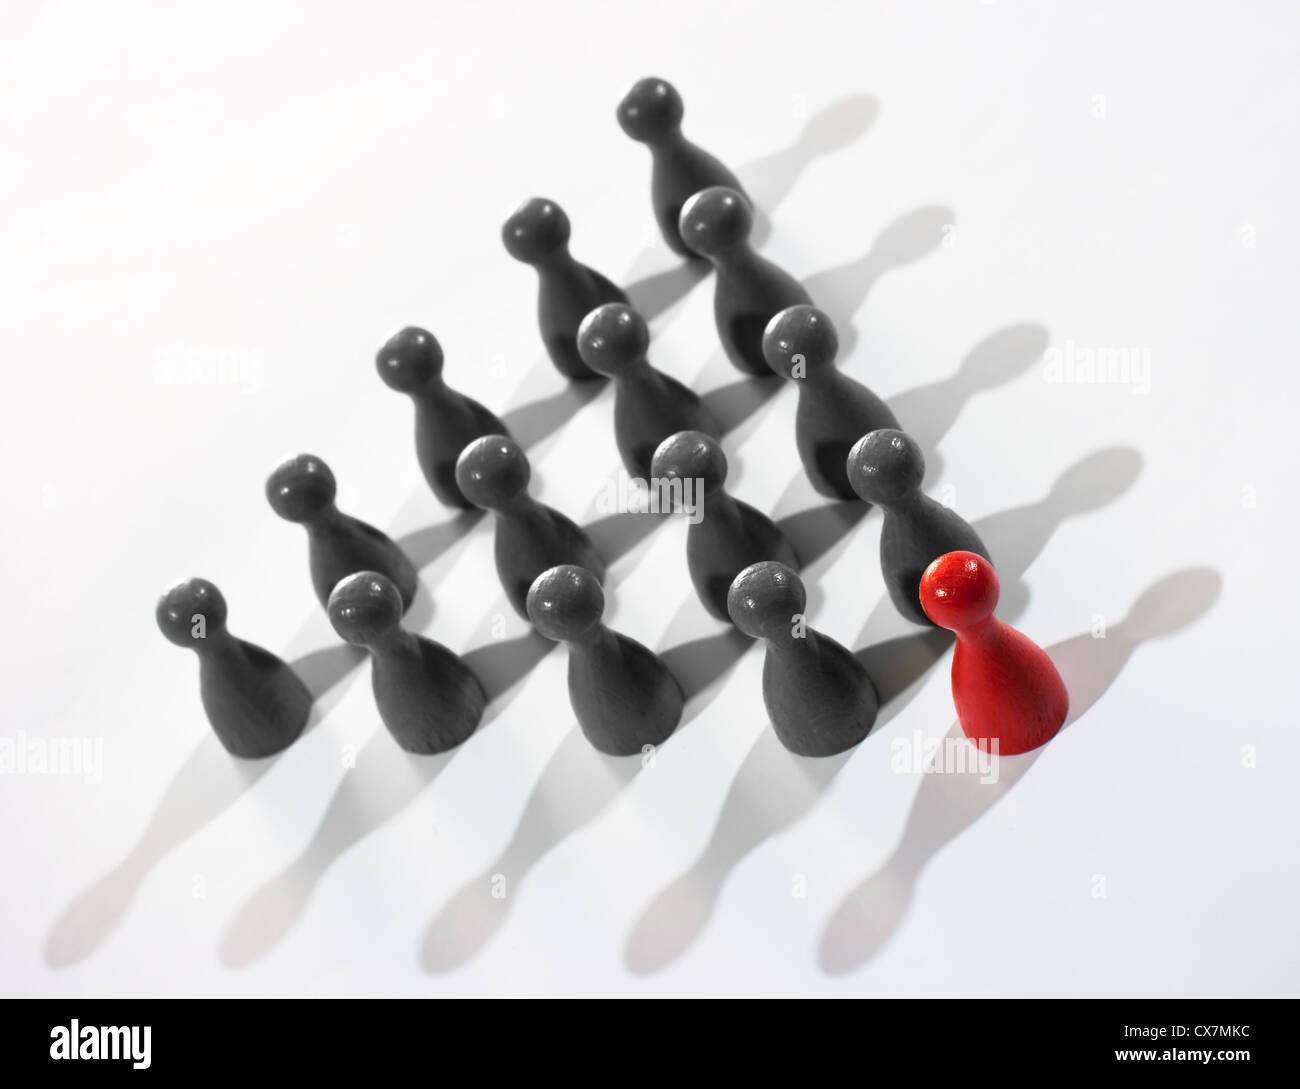 Concepto de liderazgo Imagen De Stock